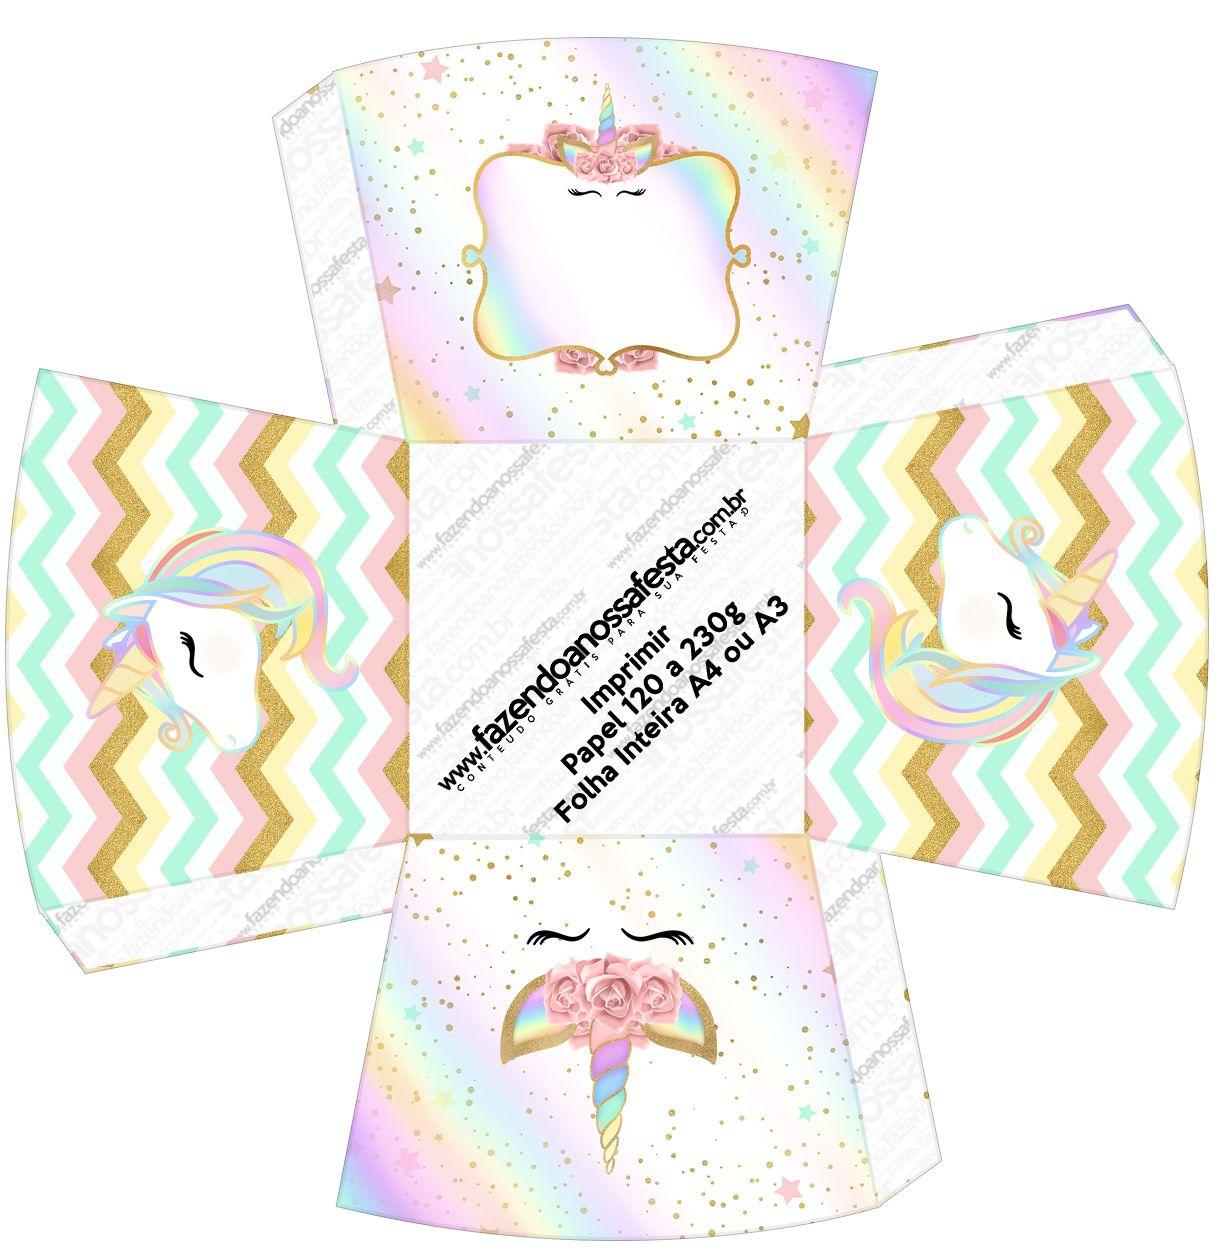 Free Printable Unicorn Kit 065 Jpg 1219 1252 Decoration Anniversaire Licorne Anniversaire Thème Licorne Carte Aniversaire